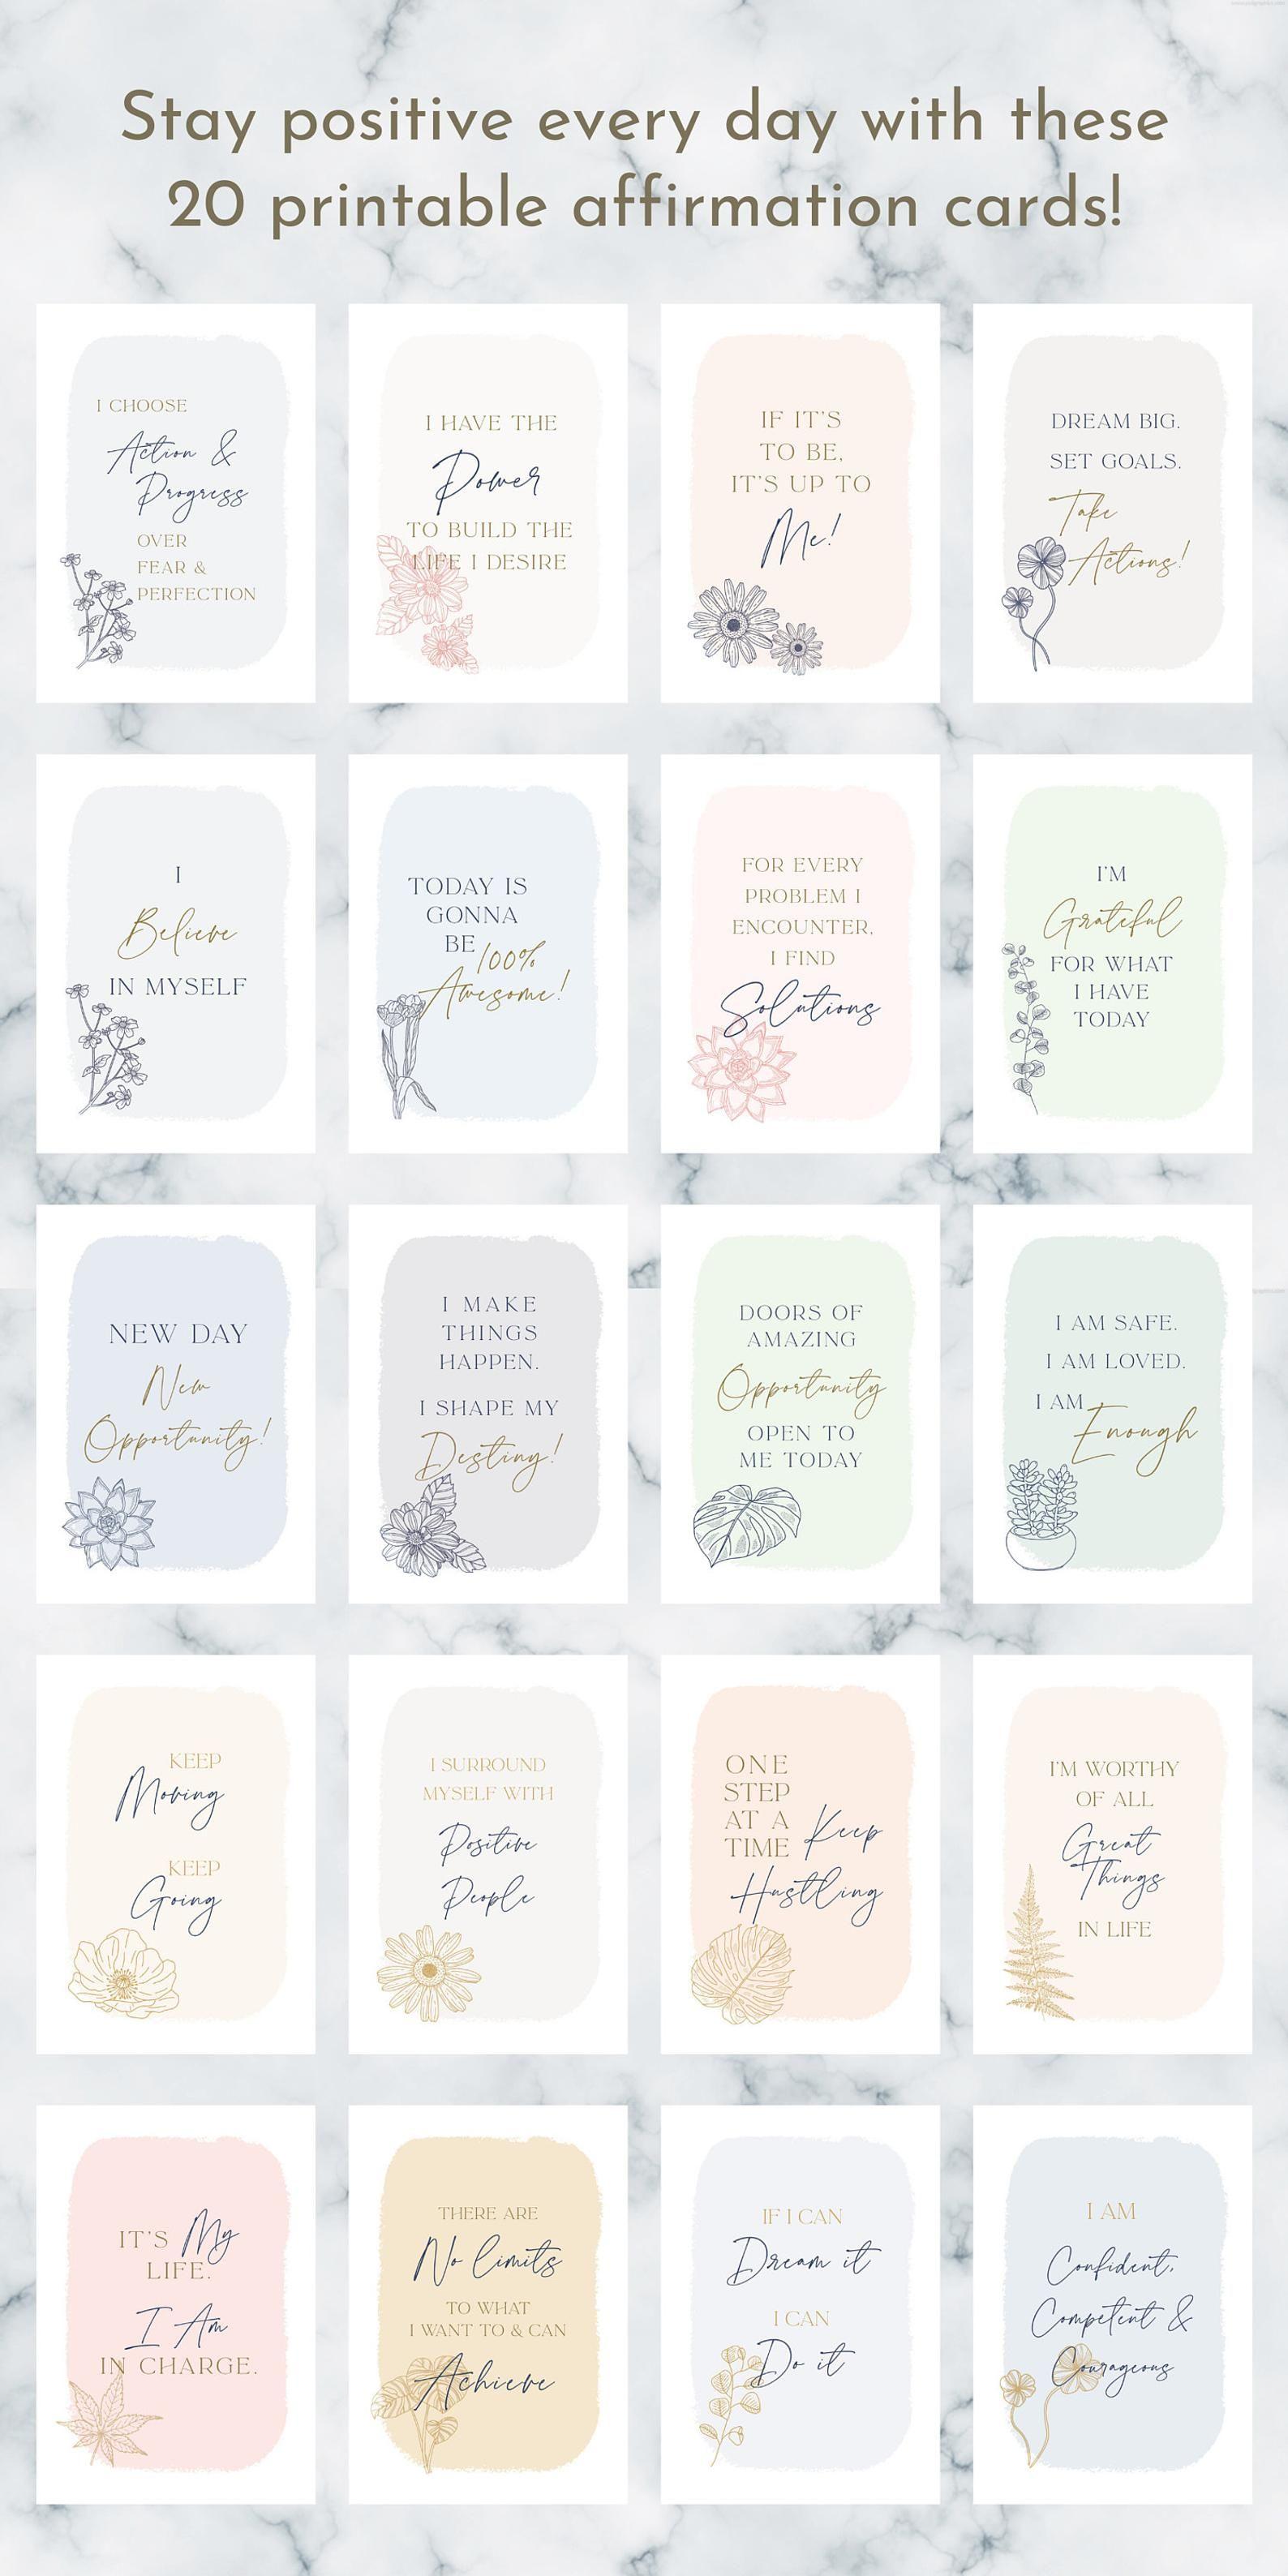 Printable Positive Cards Deck Self Affirmation Cards Affirmation Cards For Women Positive Affirmation Cards Positive Cards Printable In 2021 Affirmation Cards Positive Affirmation Cards Affirmations